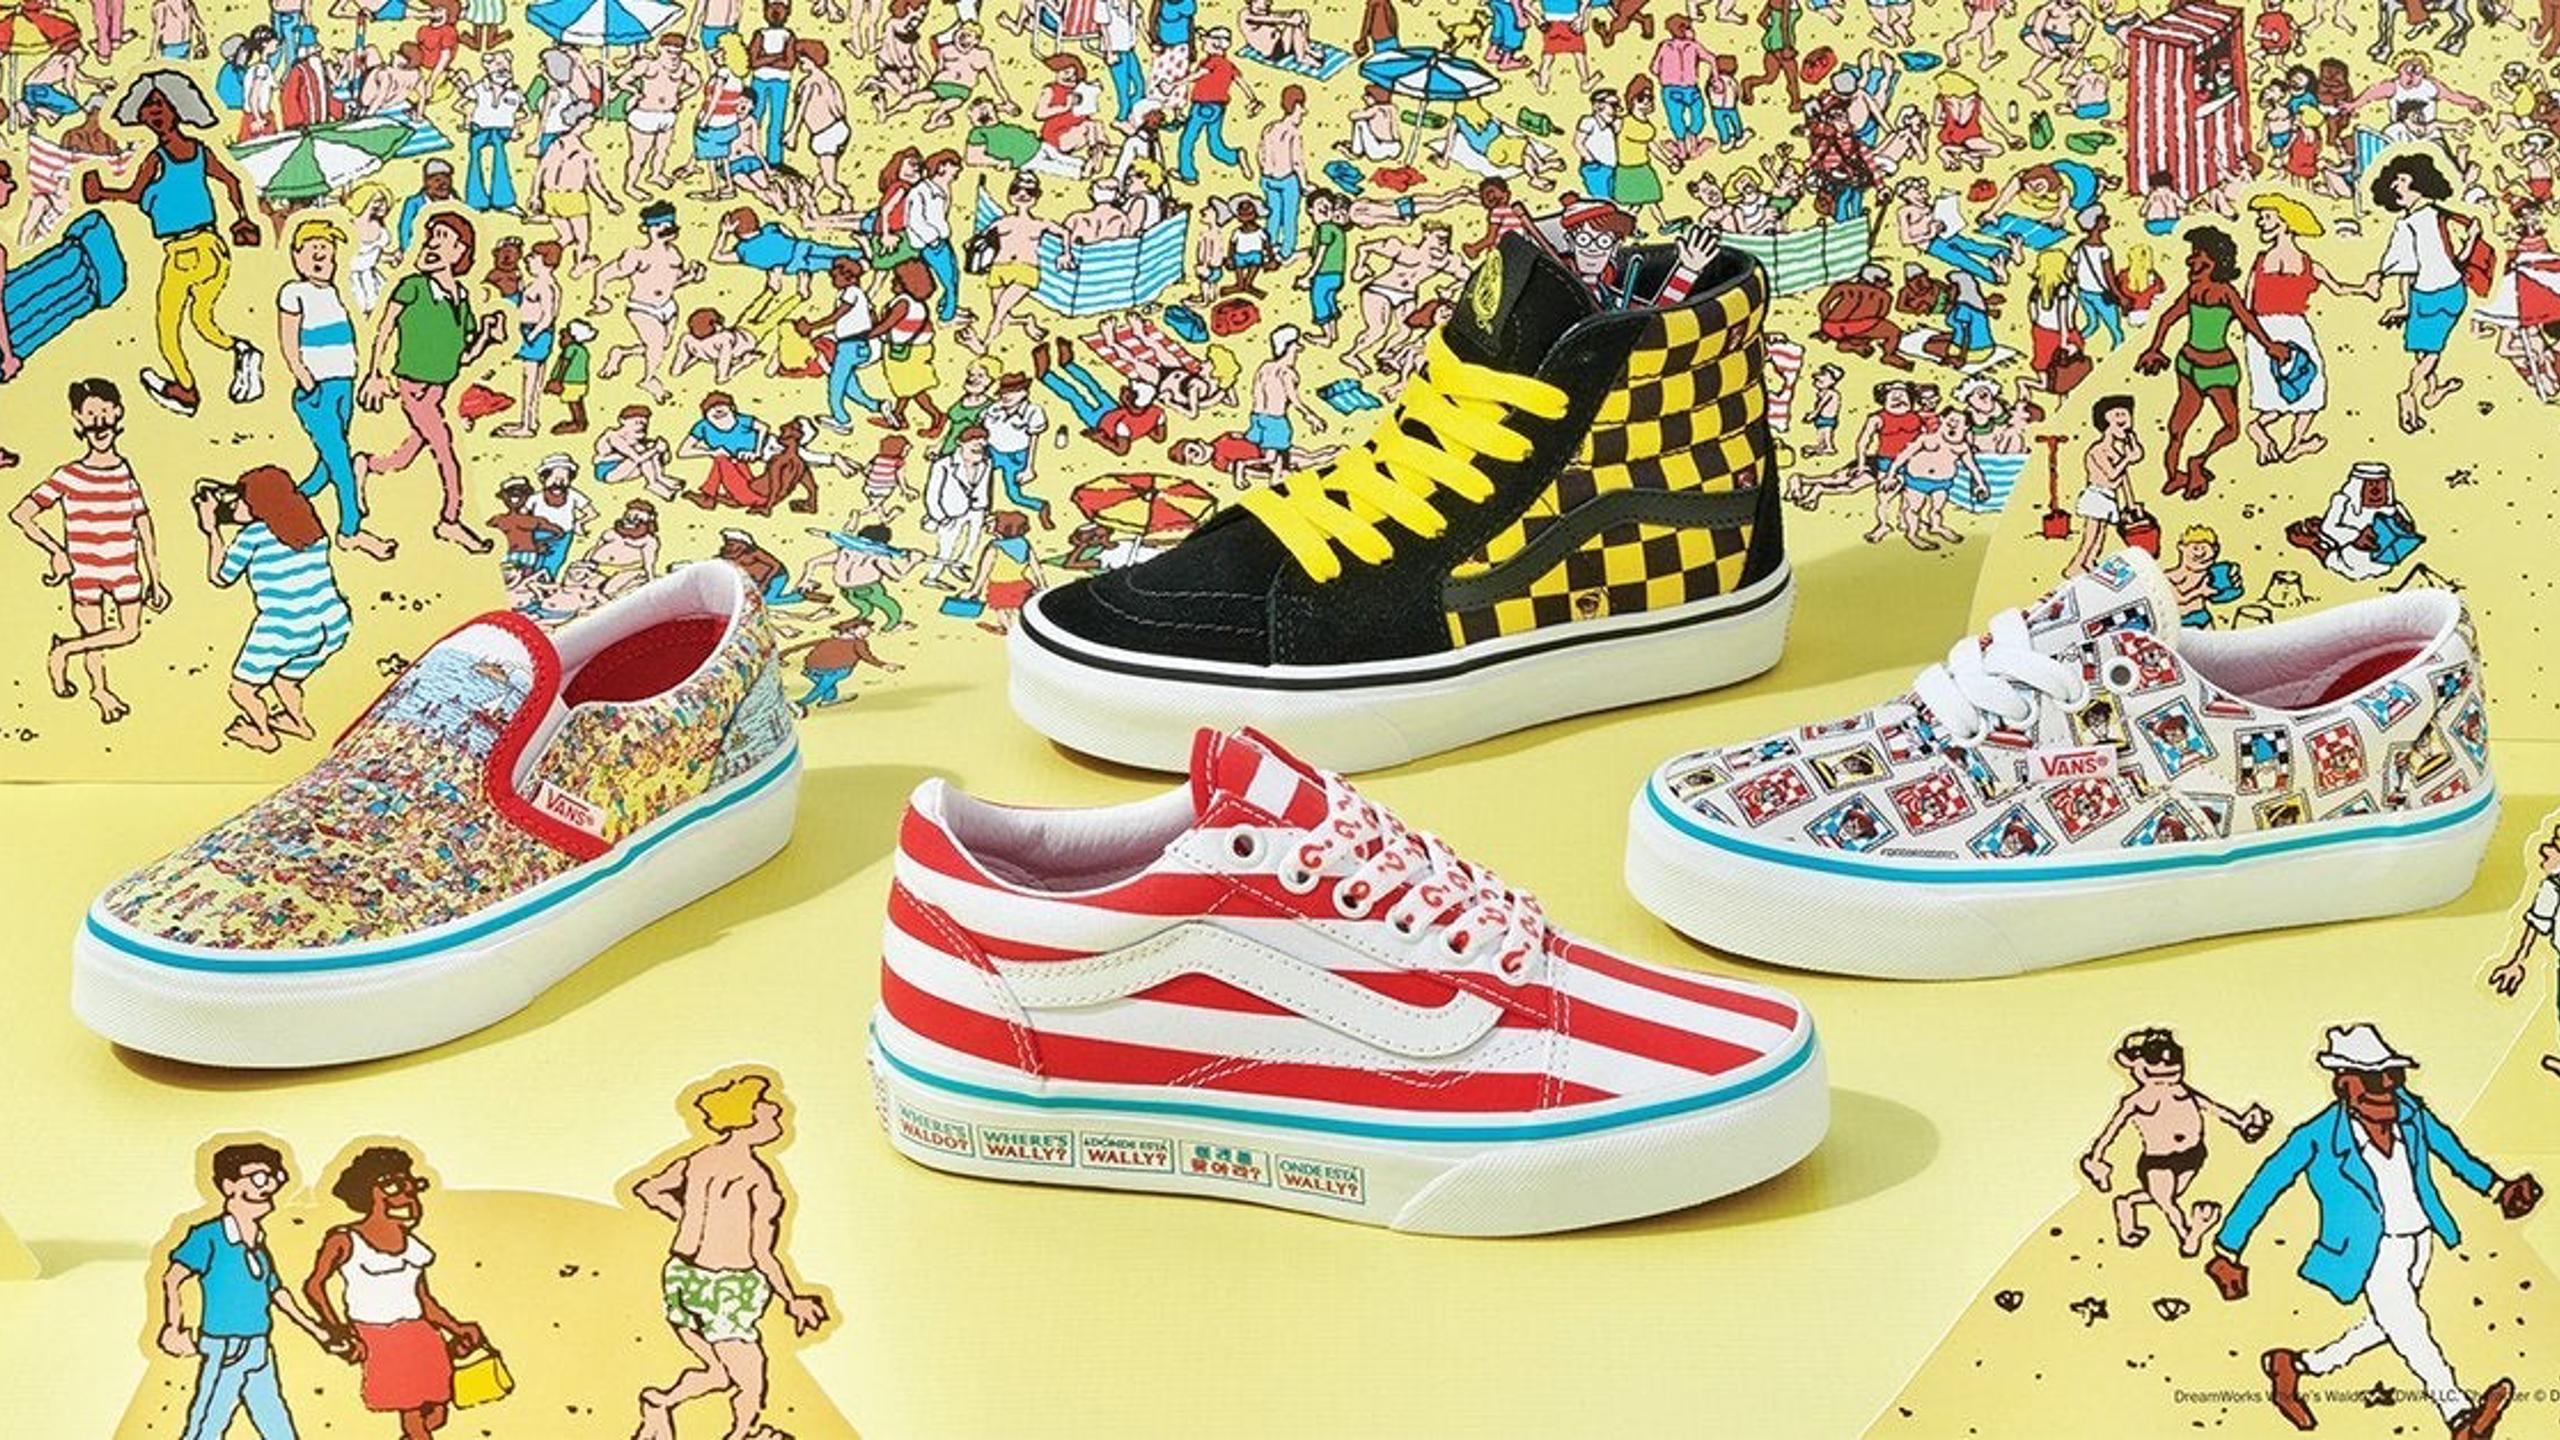 New Where's Waldo Vans